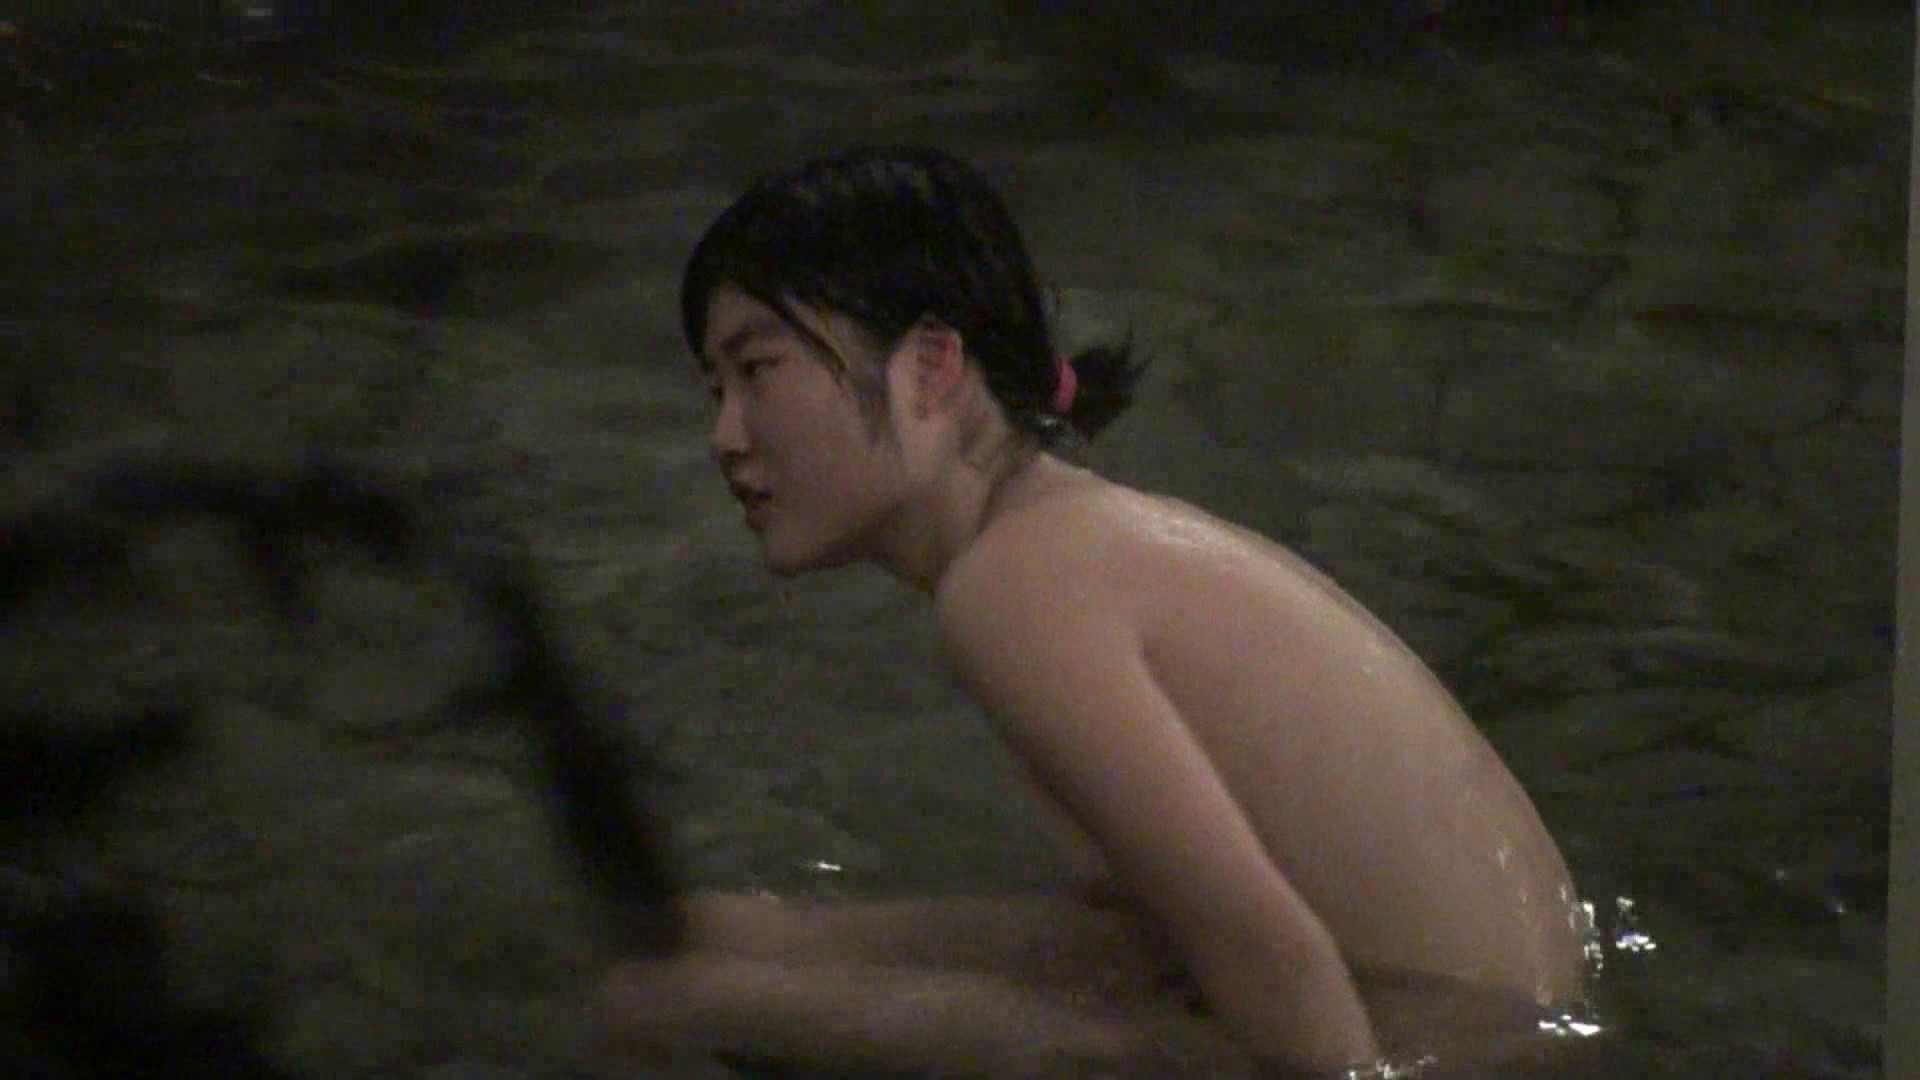 Aquaな露天風呂Vol.343 盗撮  92連発 6